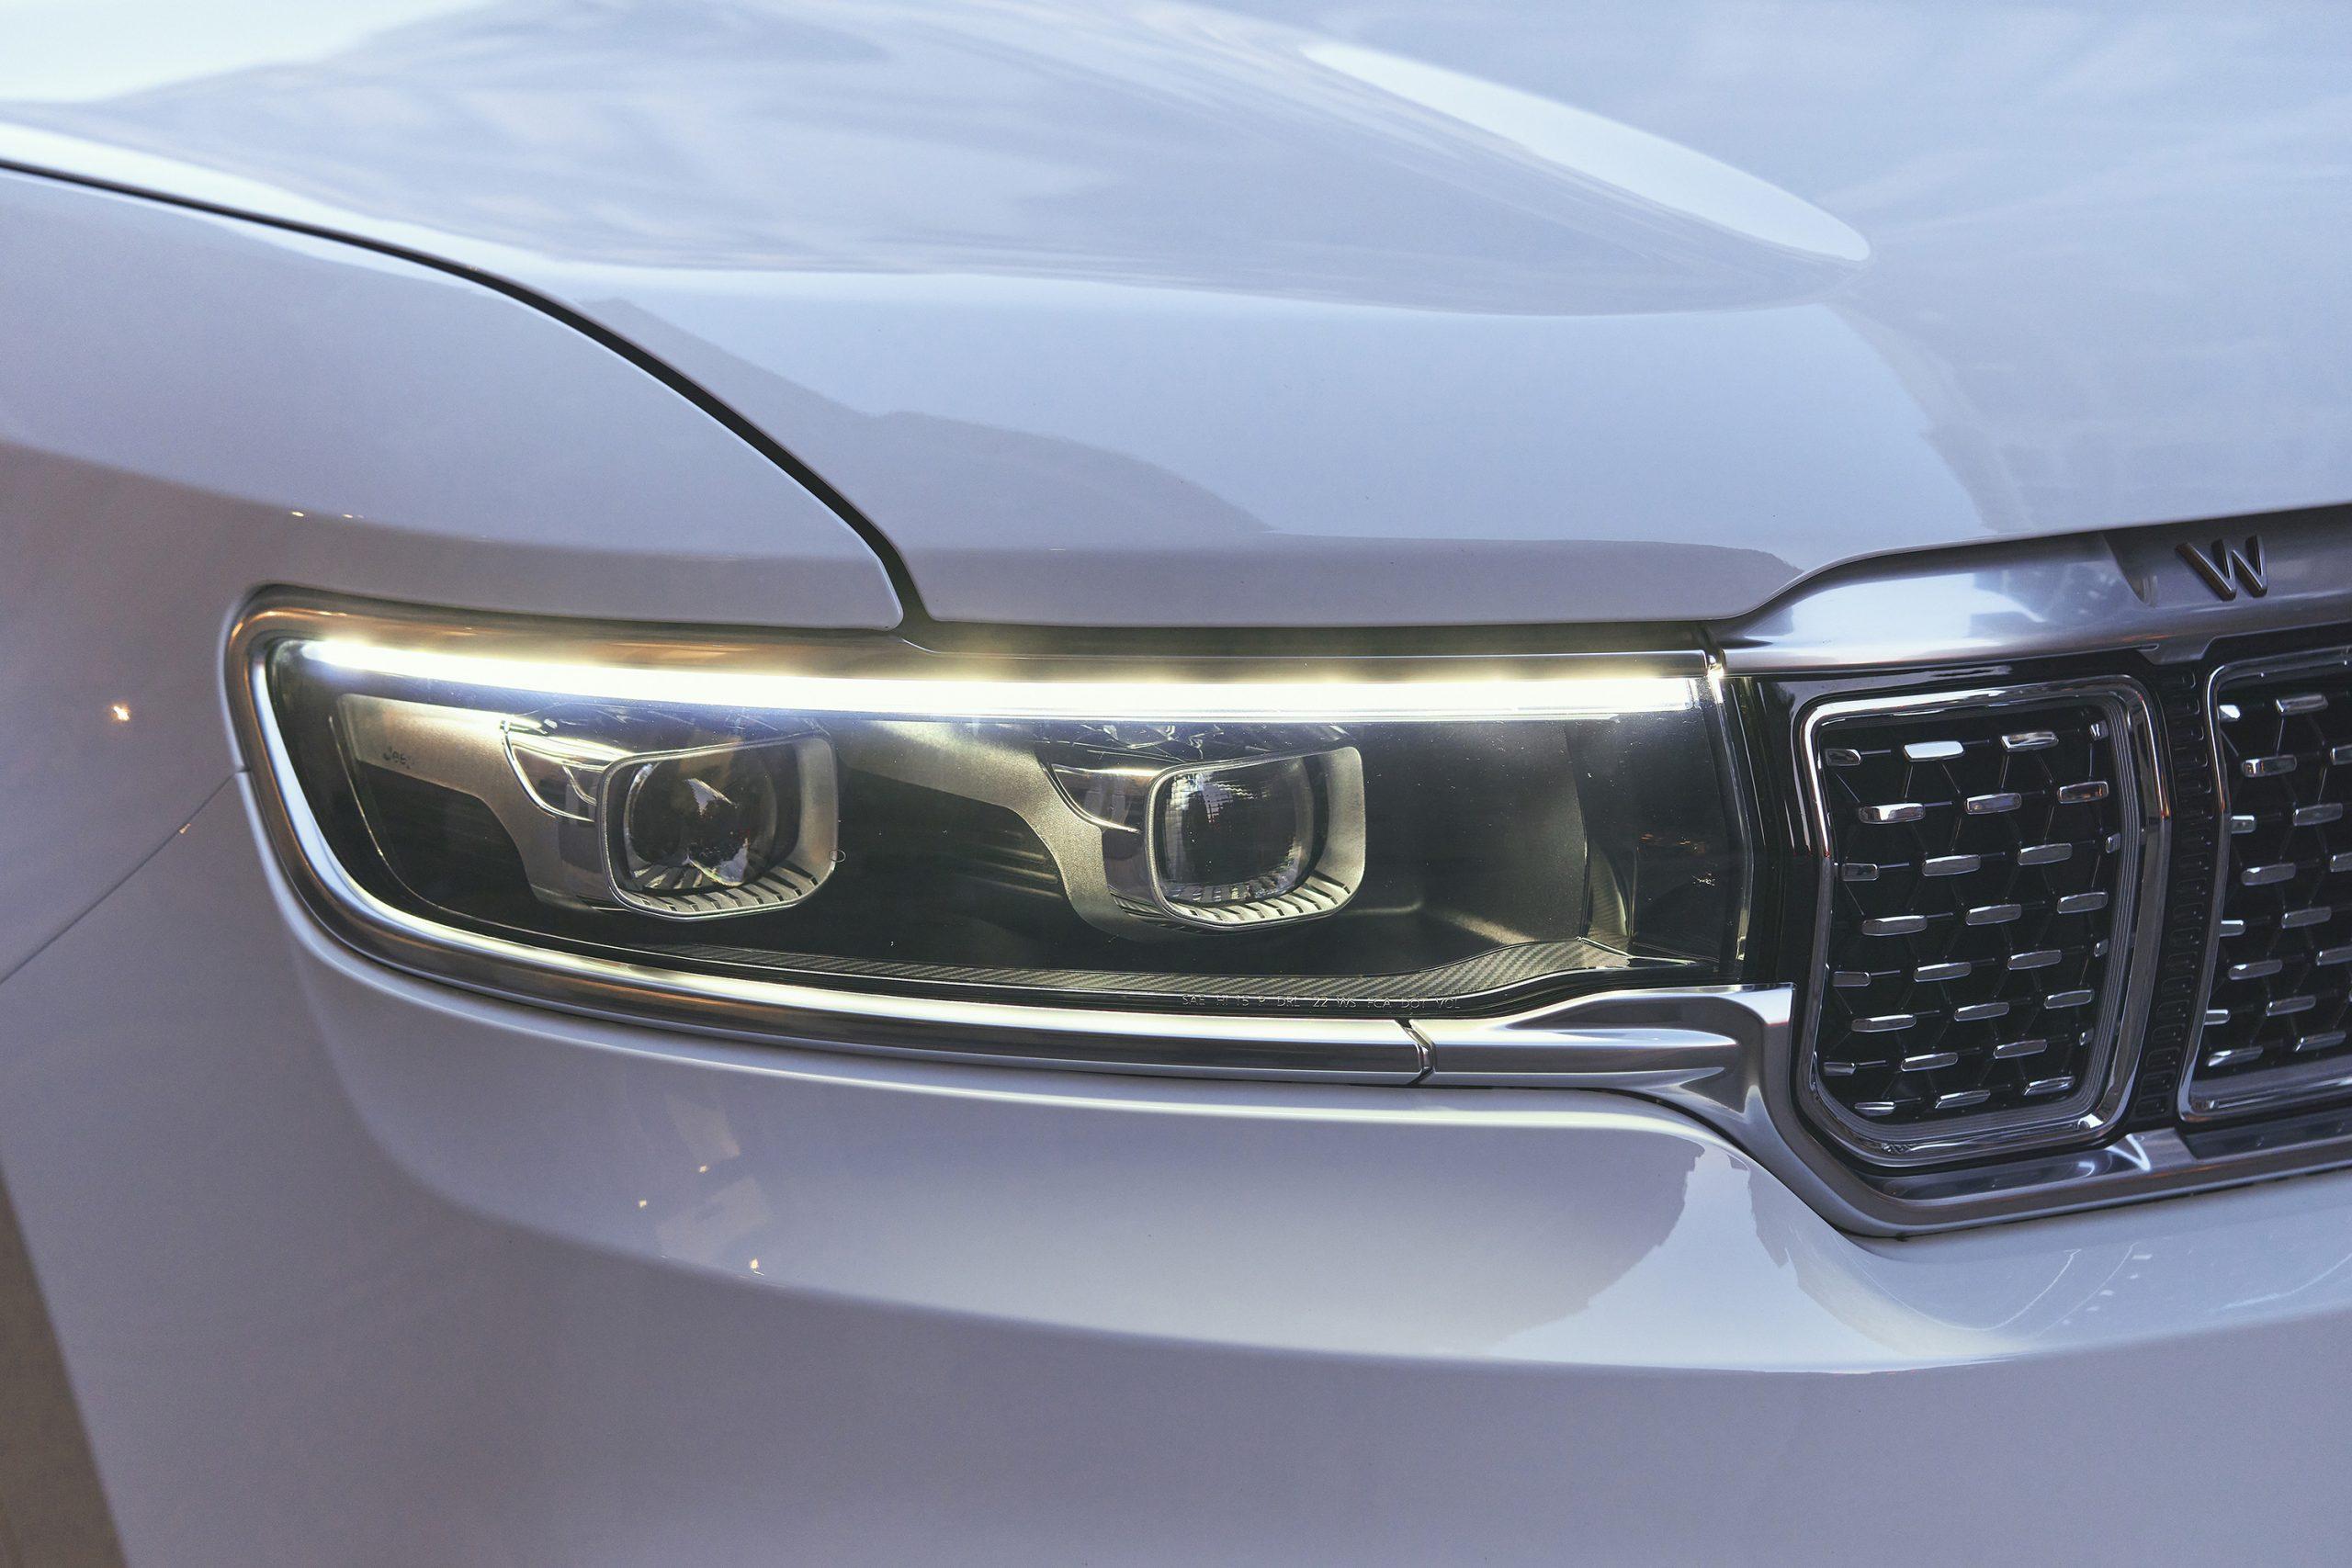 2022 Grand Wagoneer headlight